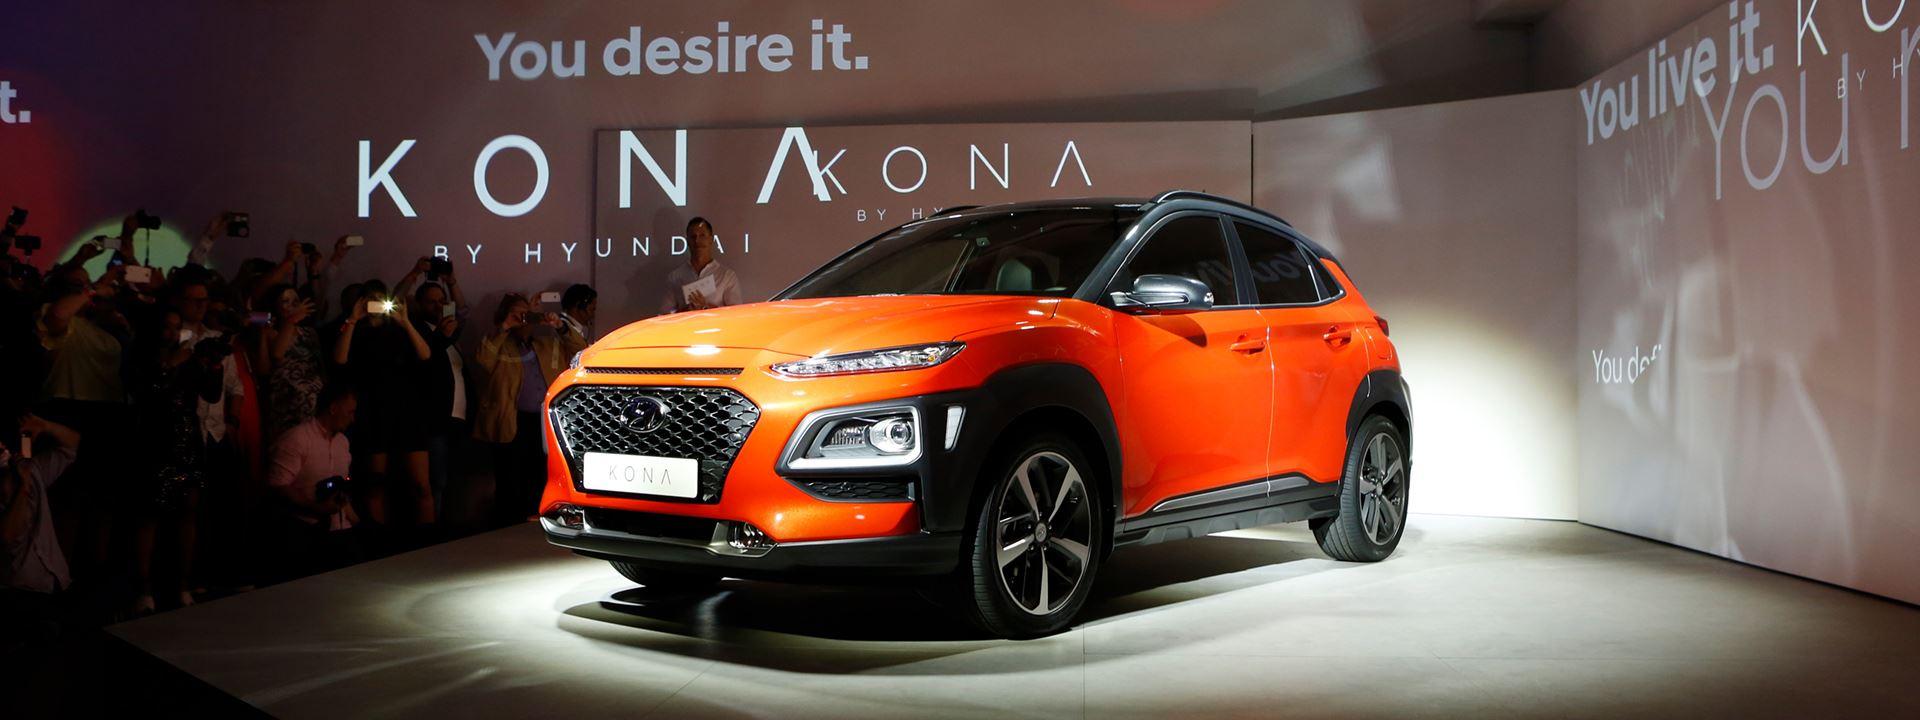 Nieuwe Hyundai KONA gepresenteerd in Milaan